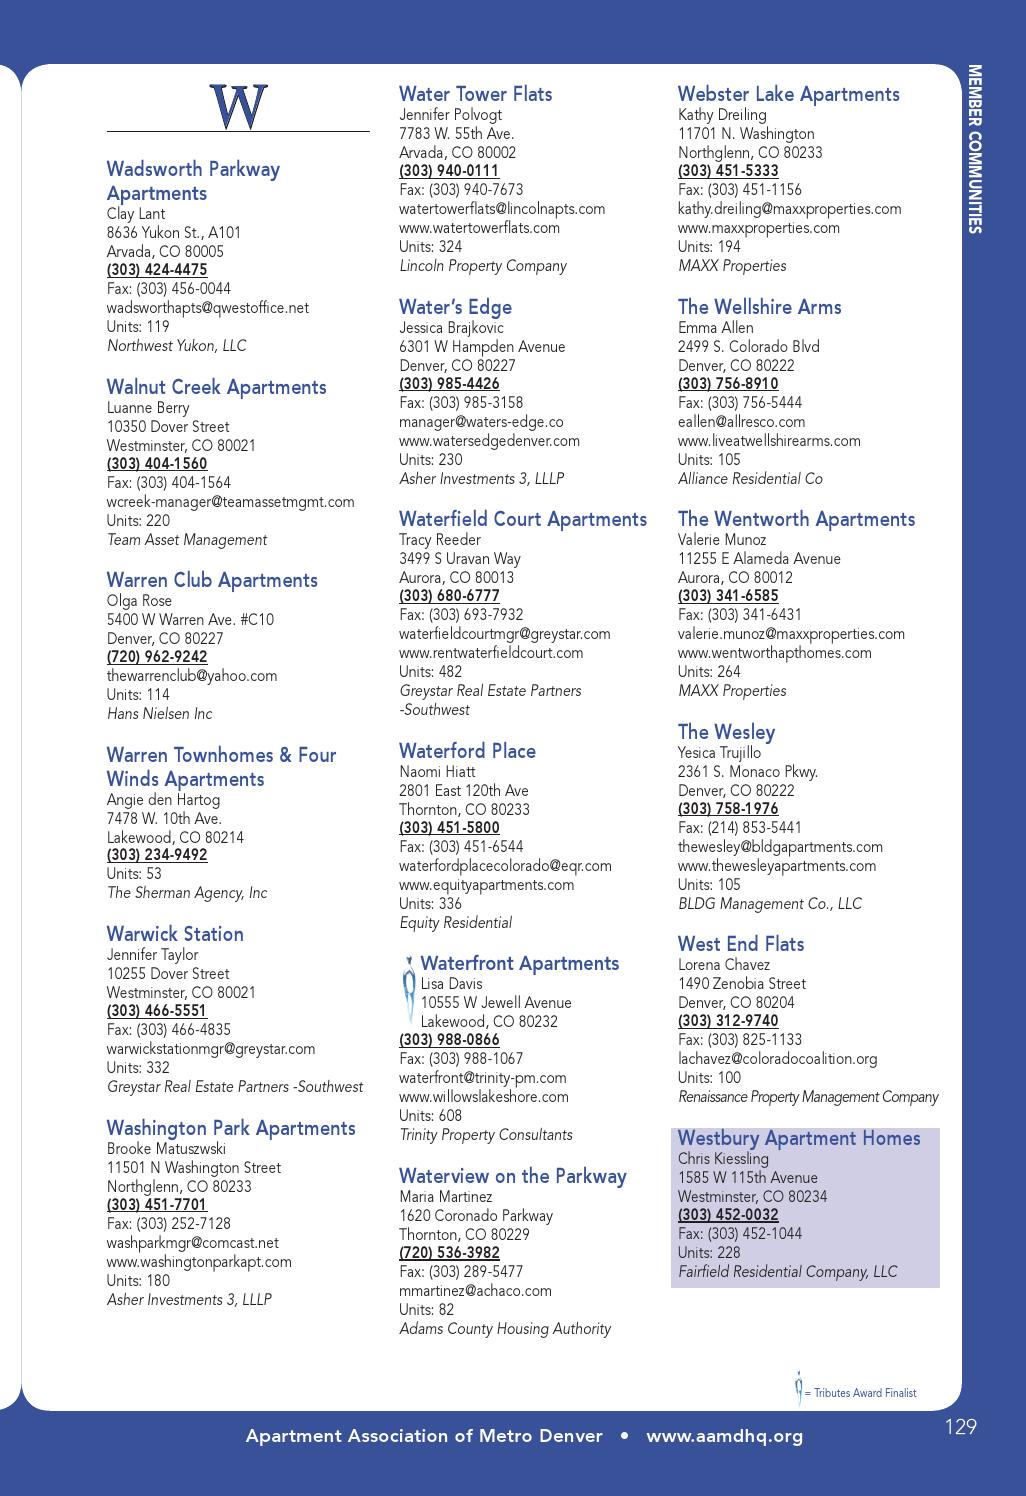 Allresco 2014 membership directoryapartment association of metro